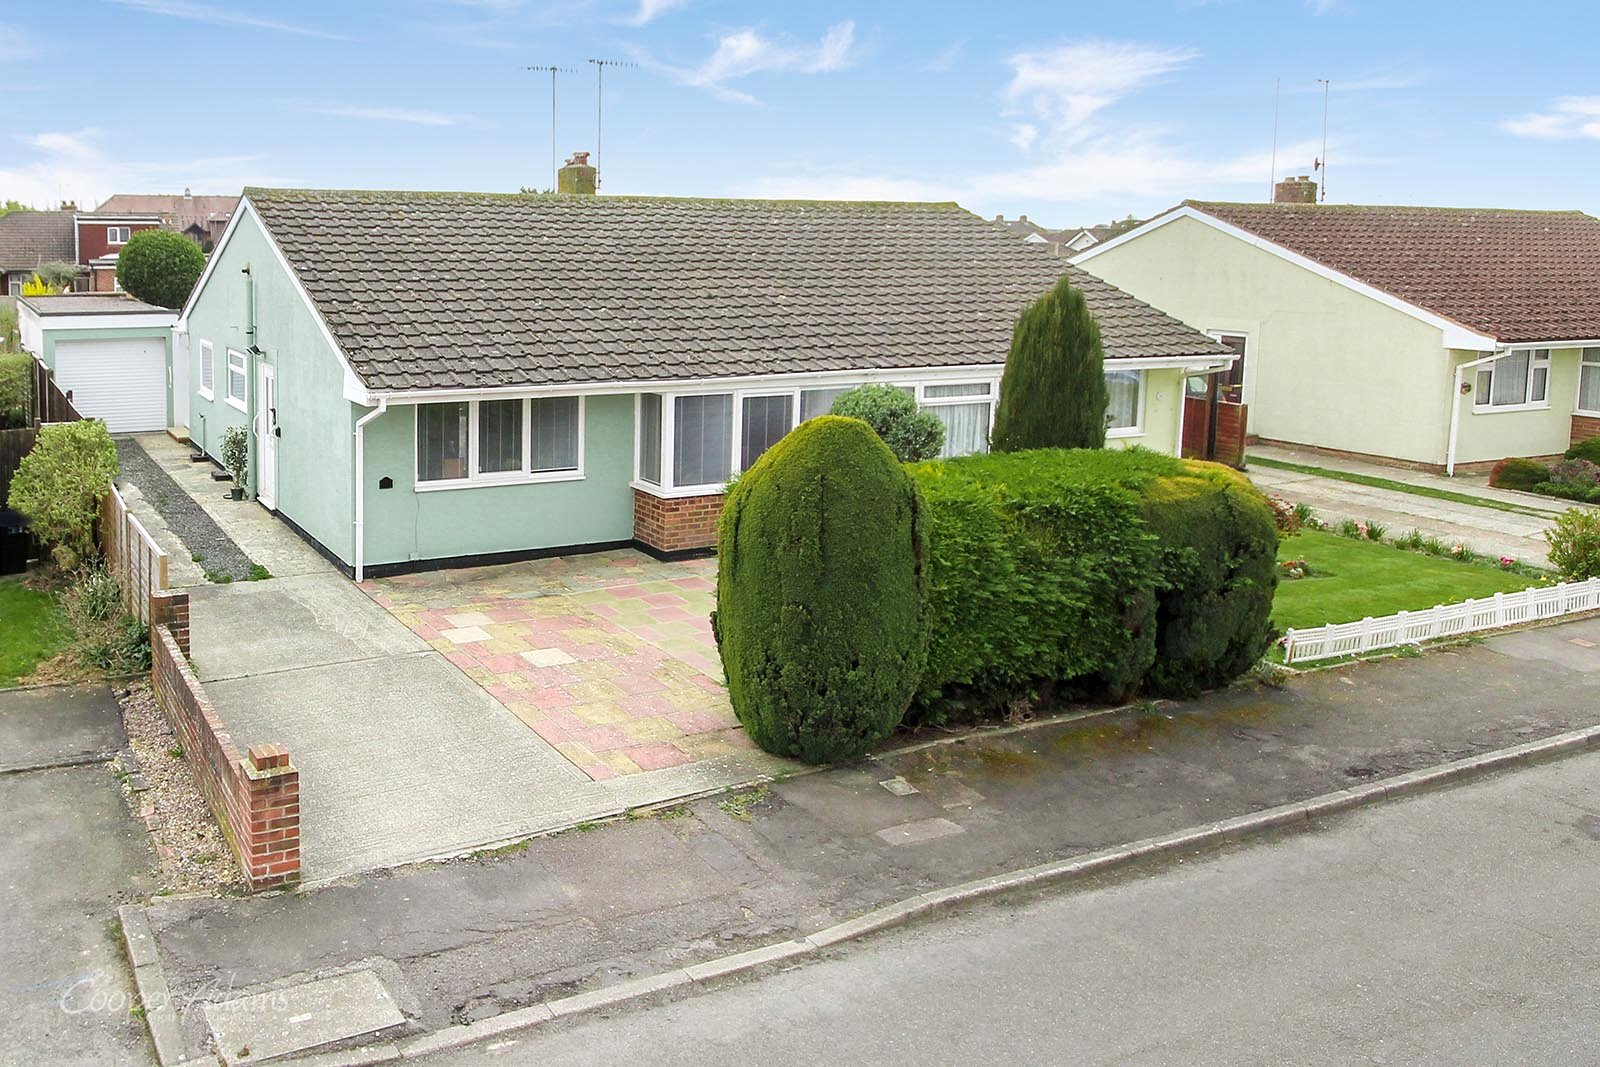 2 bed bungalow for sale in Saxon Close, East Preston, BN16